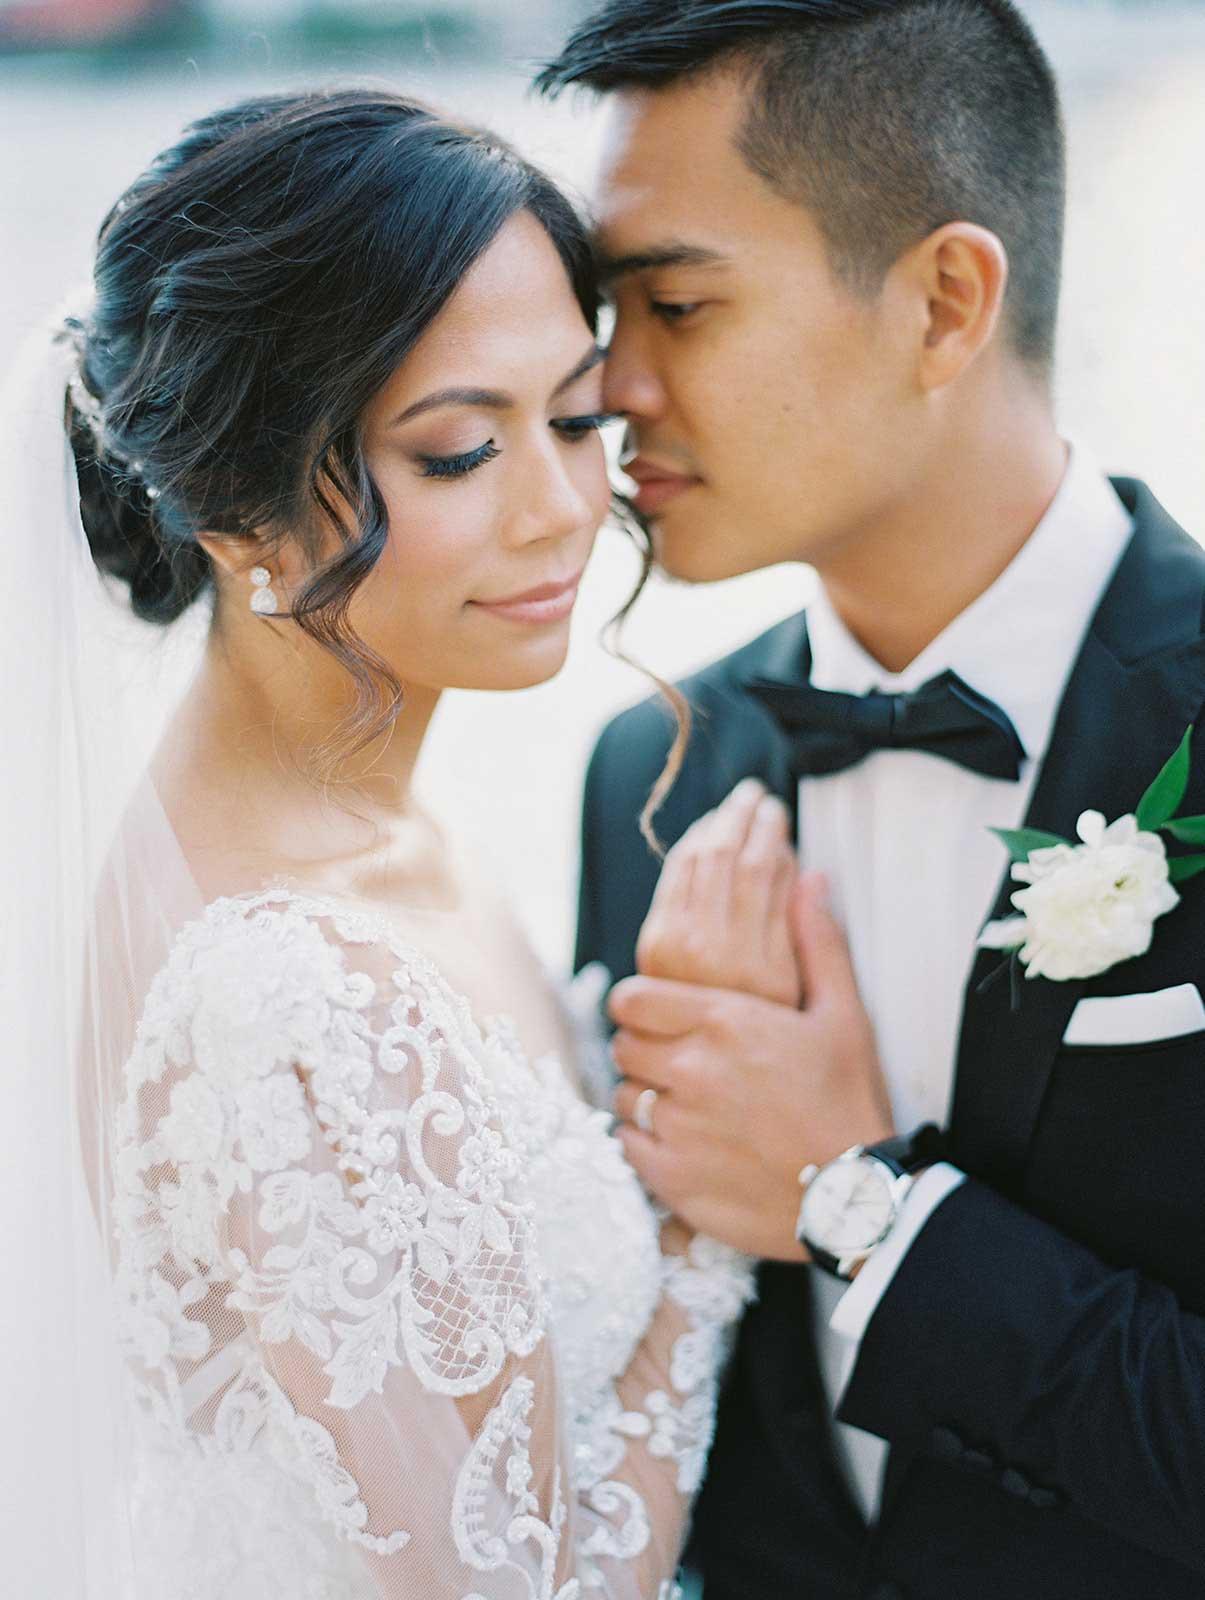 bride and groom closeup portrait.